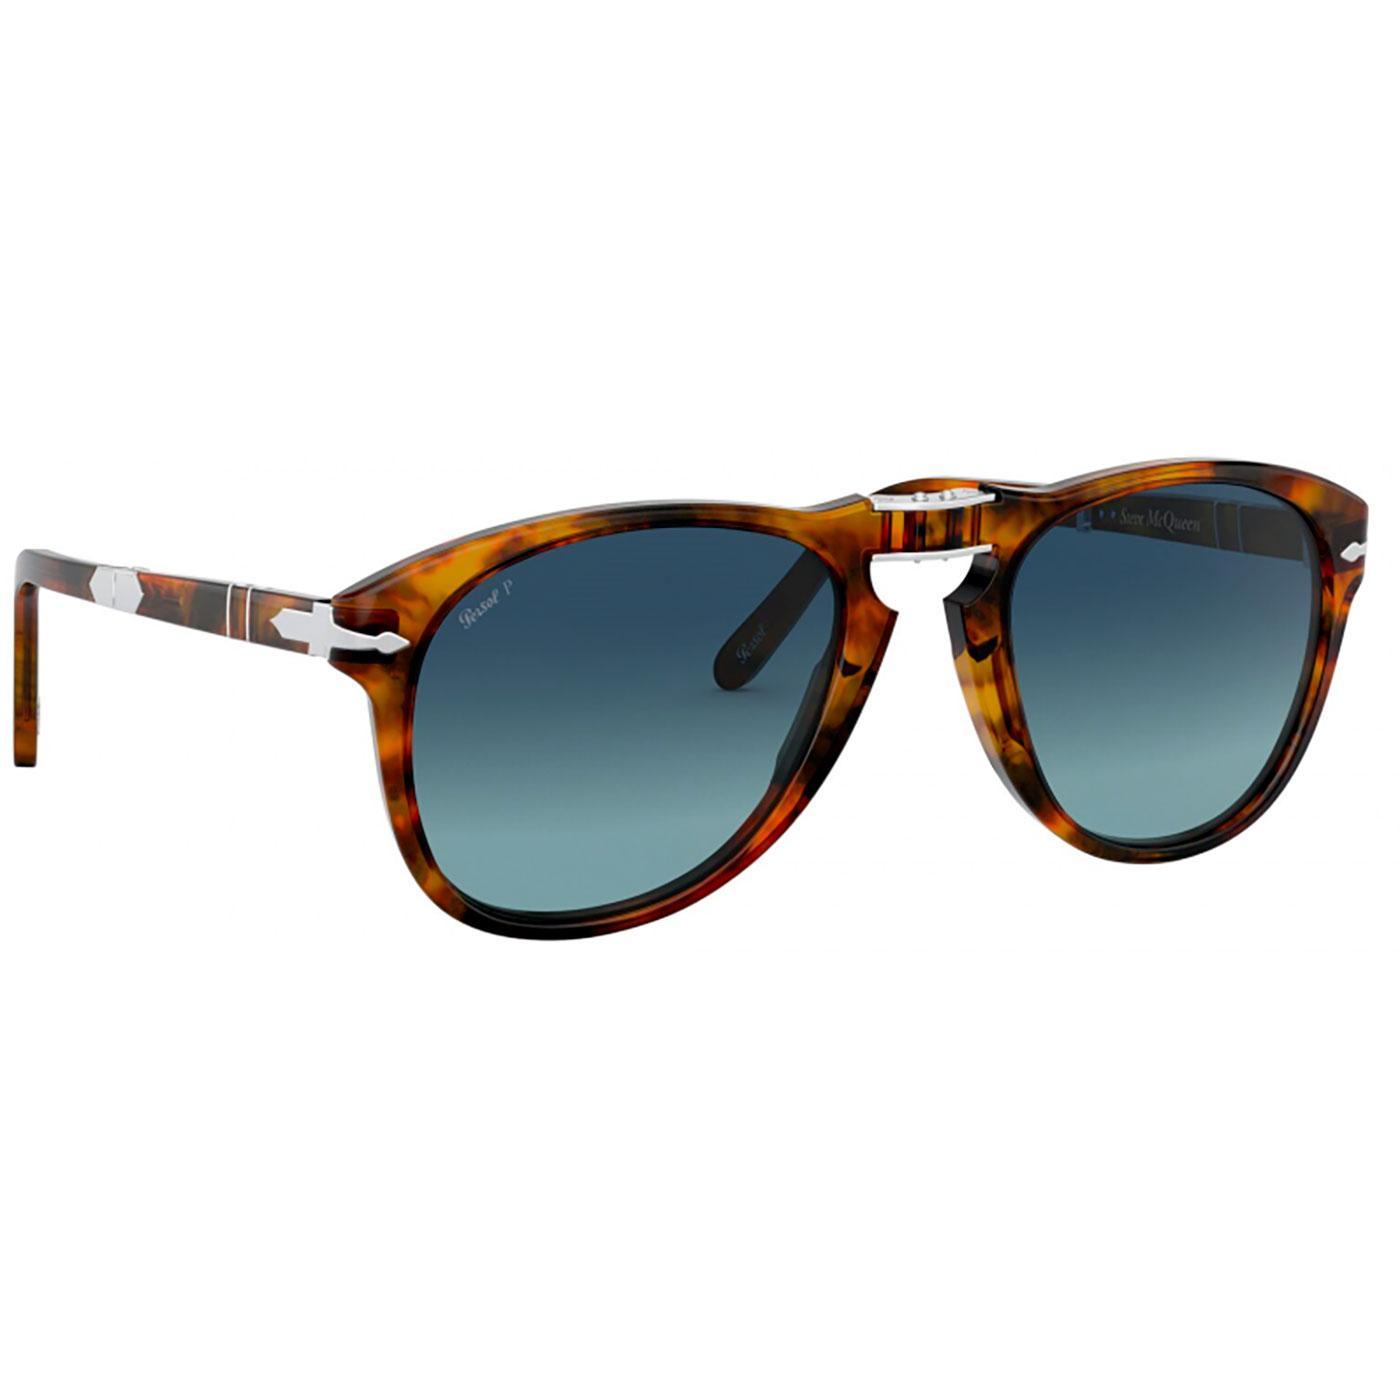 625cd9154fe9 PERSOL Steve McQueen 714SM Foldable Sunglasses in Caffe